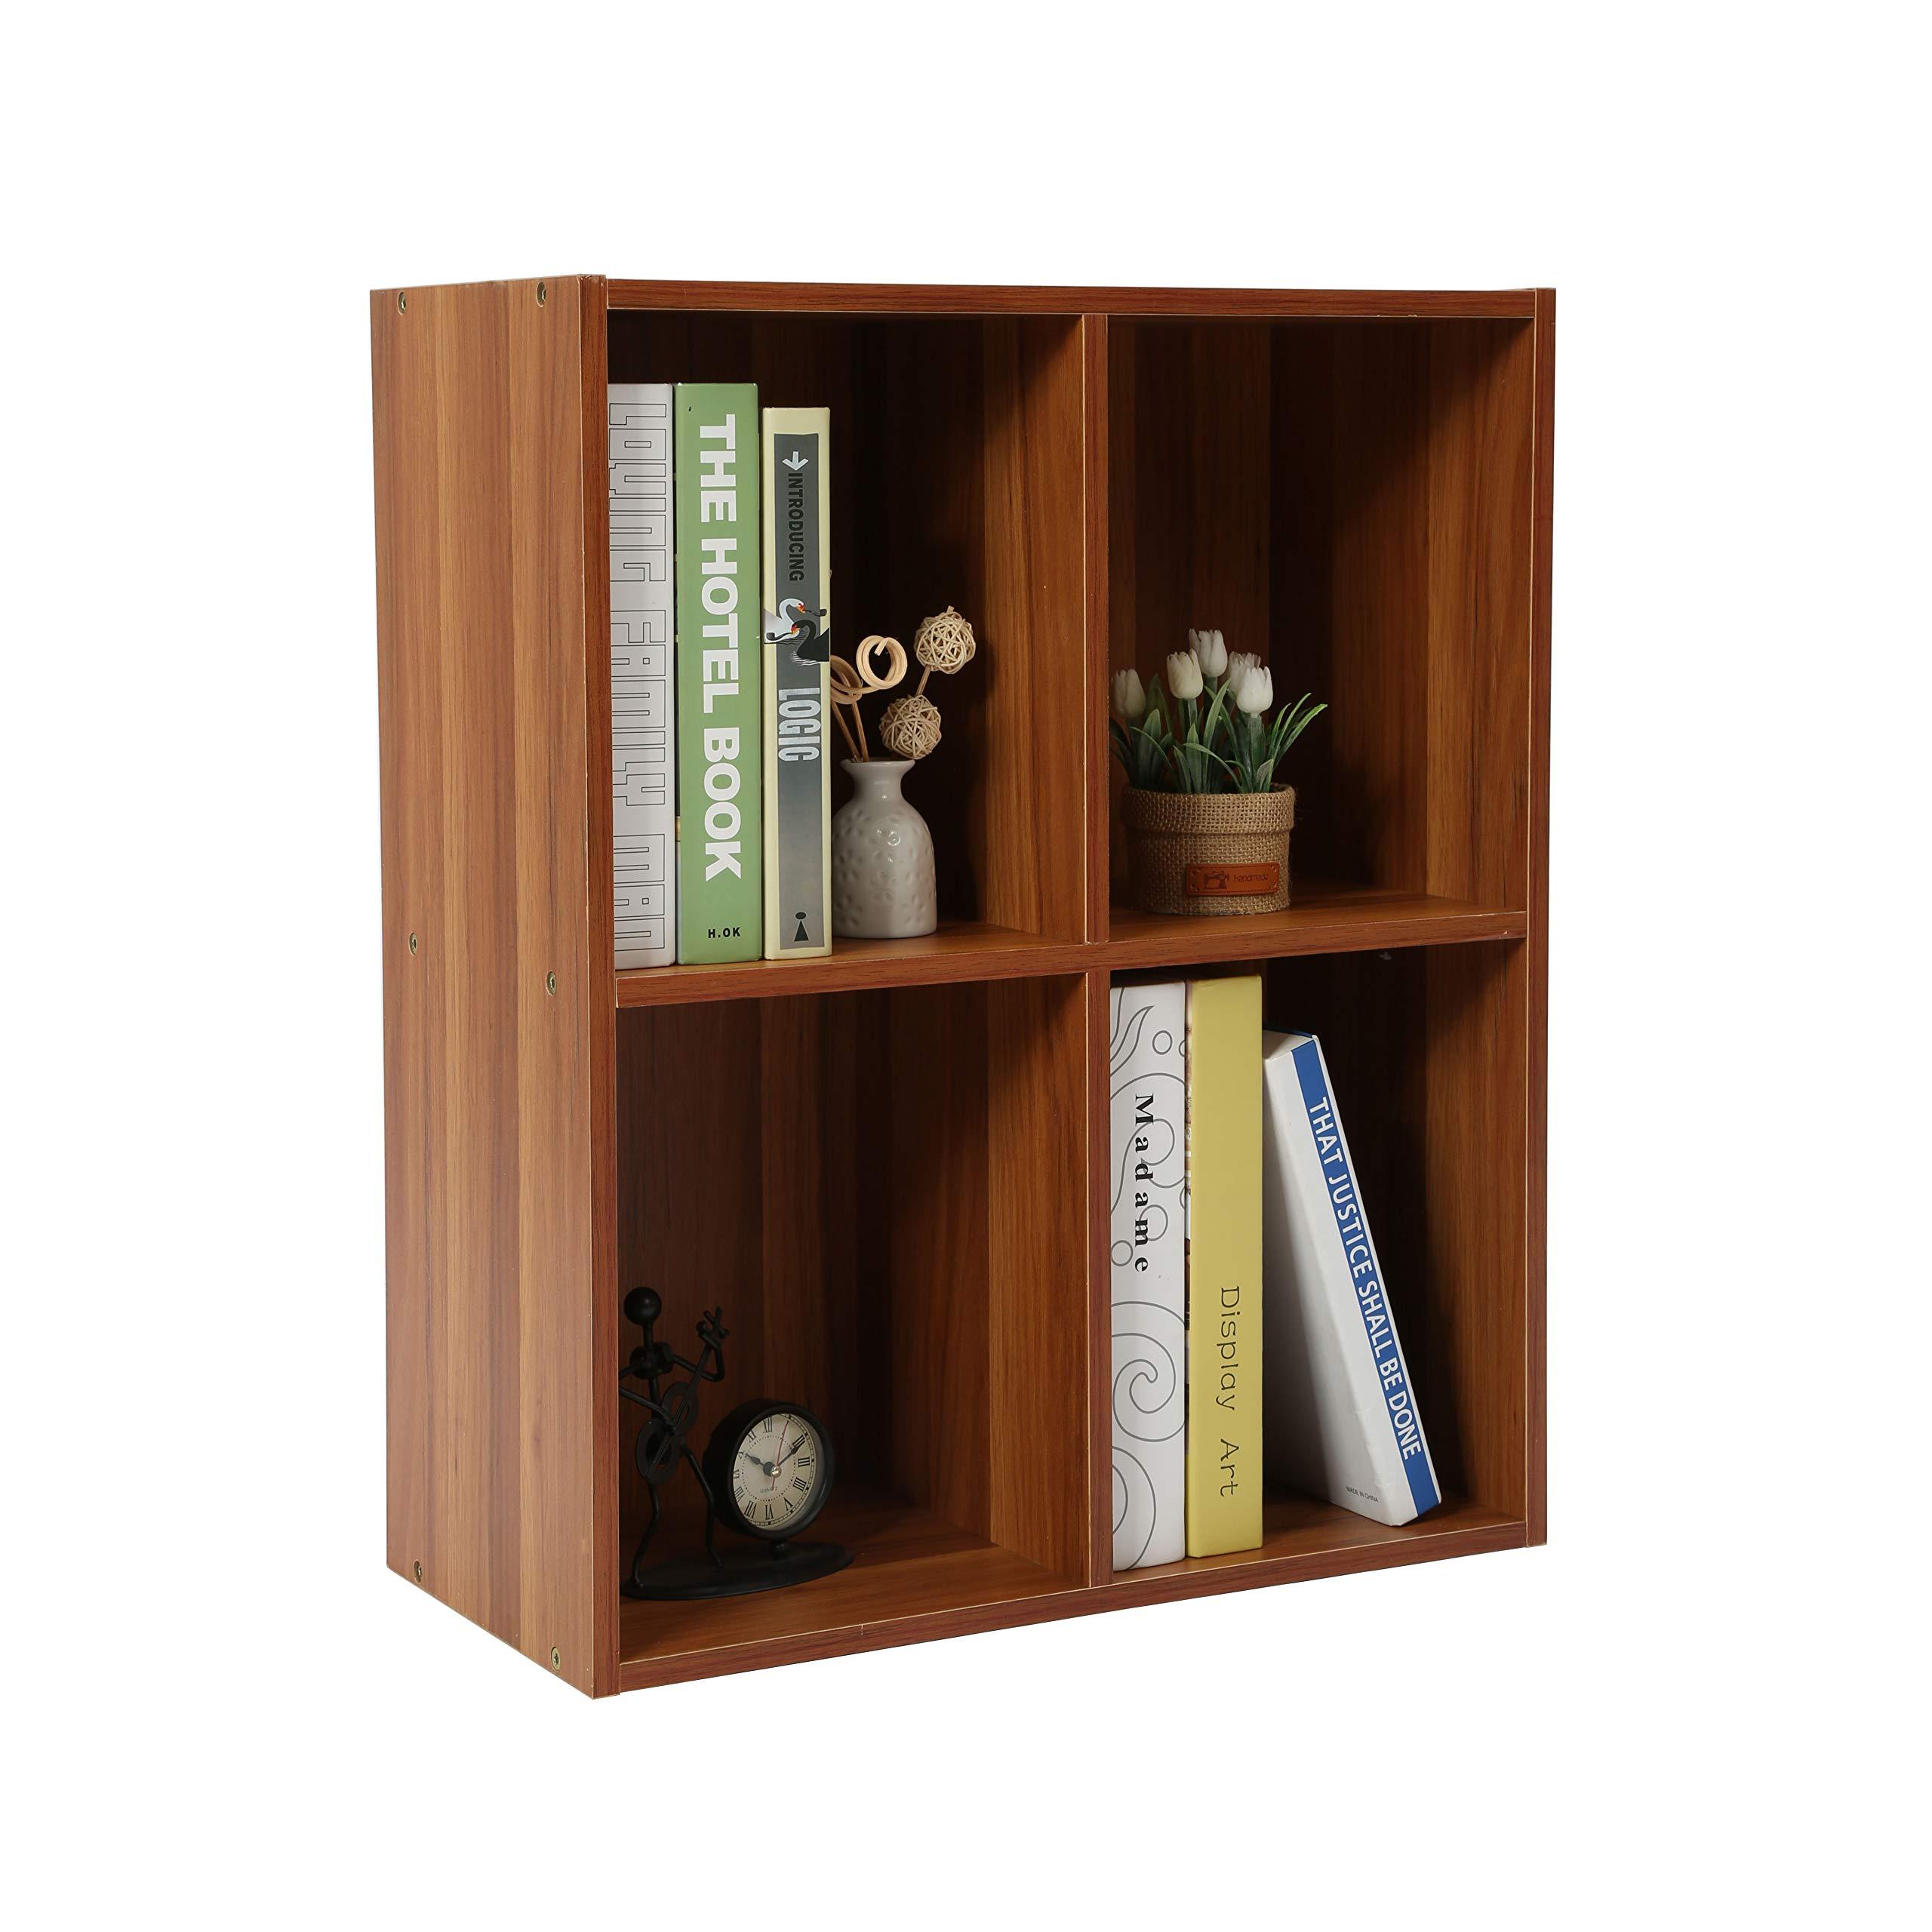 Homebi 4-Cube Bookshelf DIY Bookcase Wood Storage Cabinet Freestanding Organizer Display Shelving Unit for Bedroom,Living Room,Study Room and Office,19.69'' Wx9.45 Dx23.62 H (Walnut)